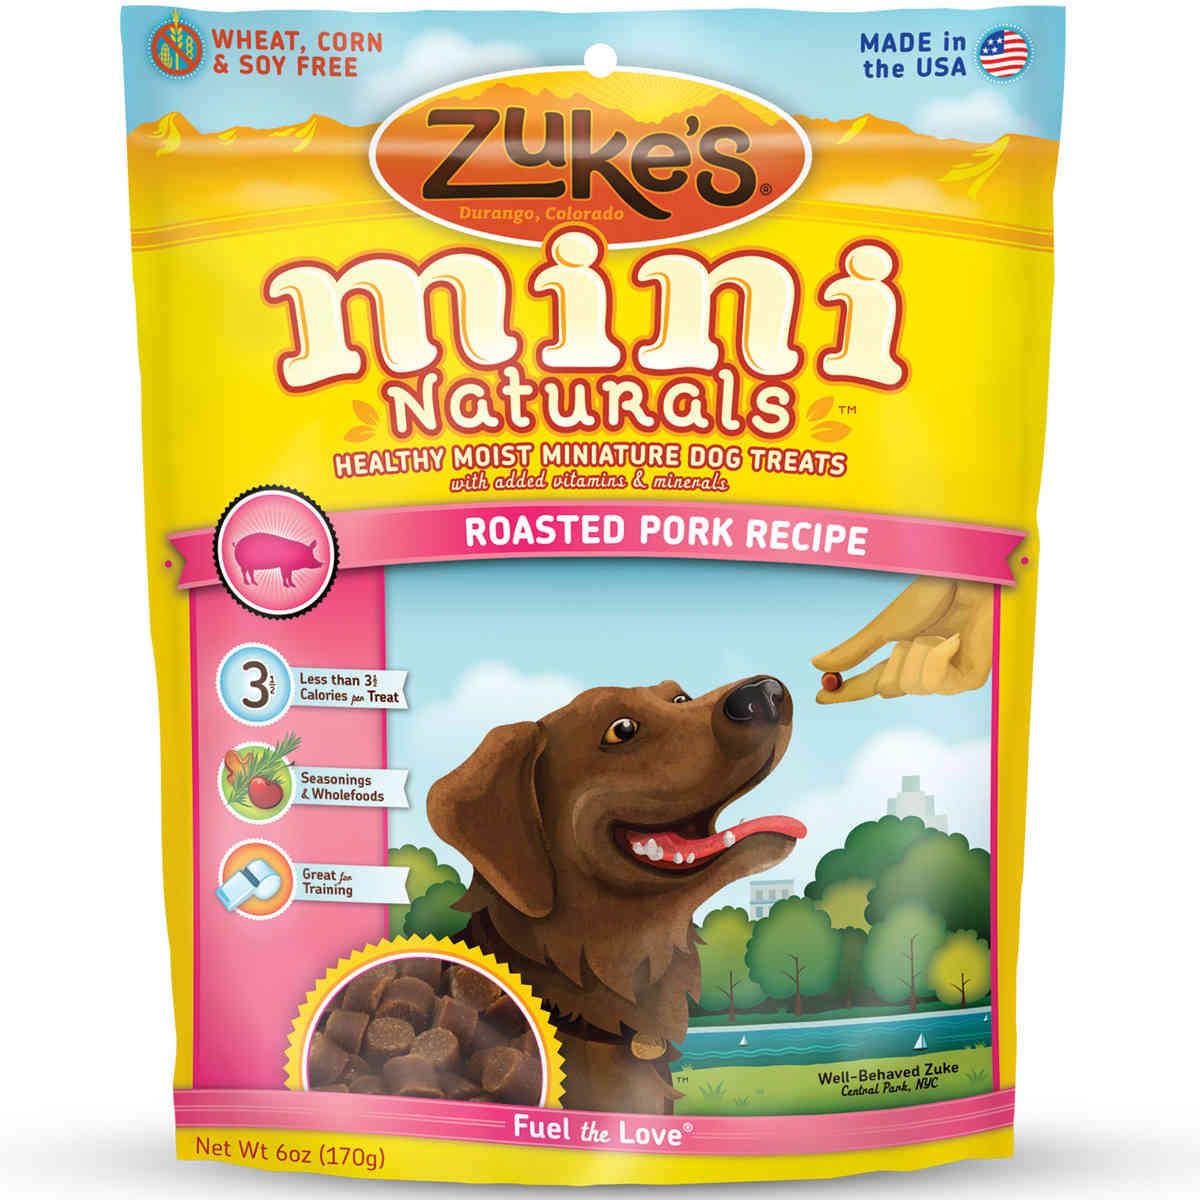 Zuke's Mini Naturals Moist Miniature Treat for Dogs Roasted Pork 6 oz.